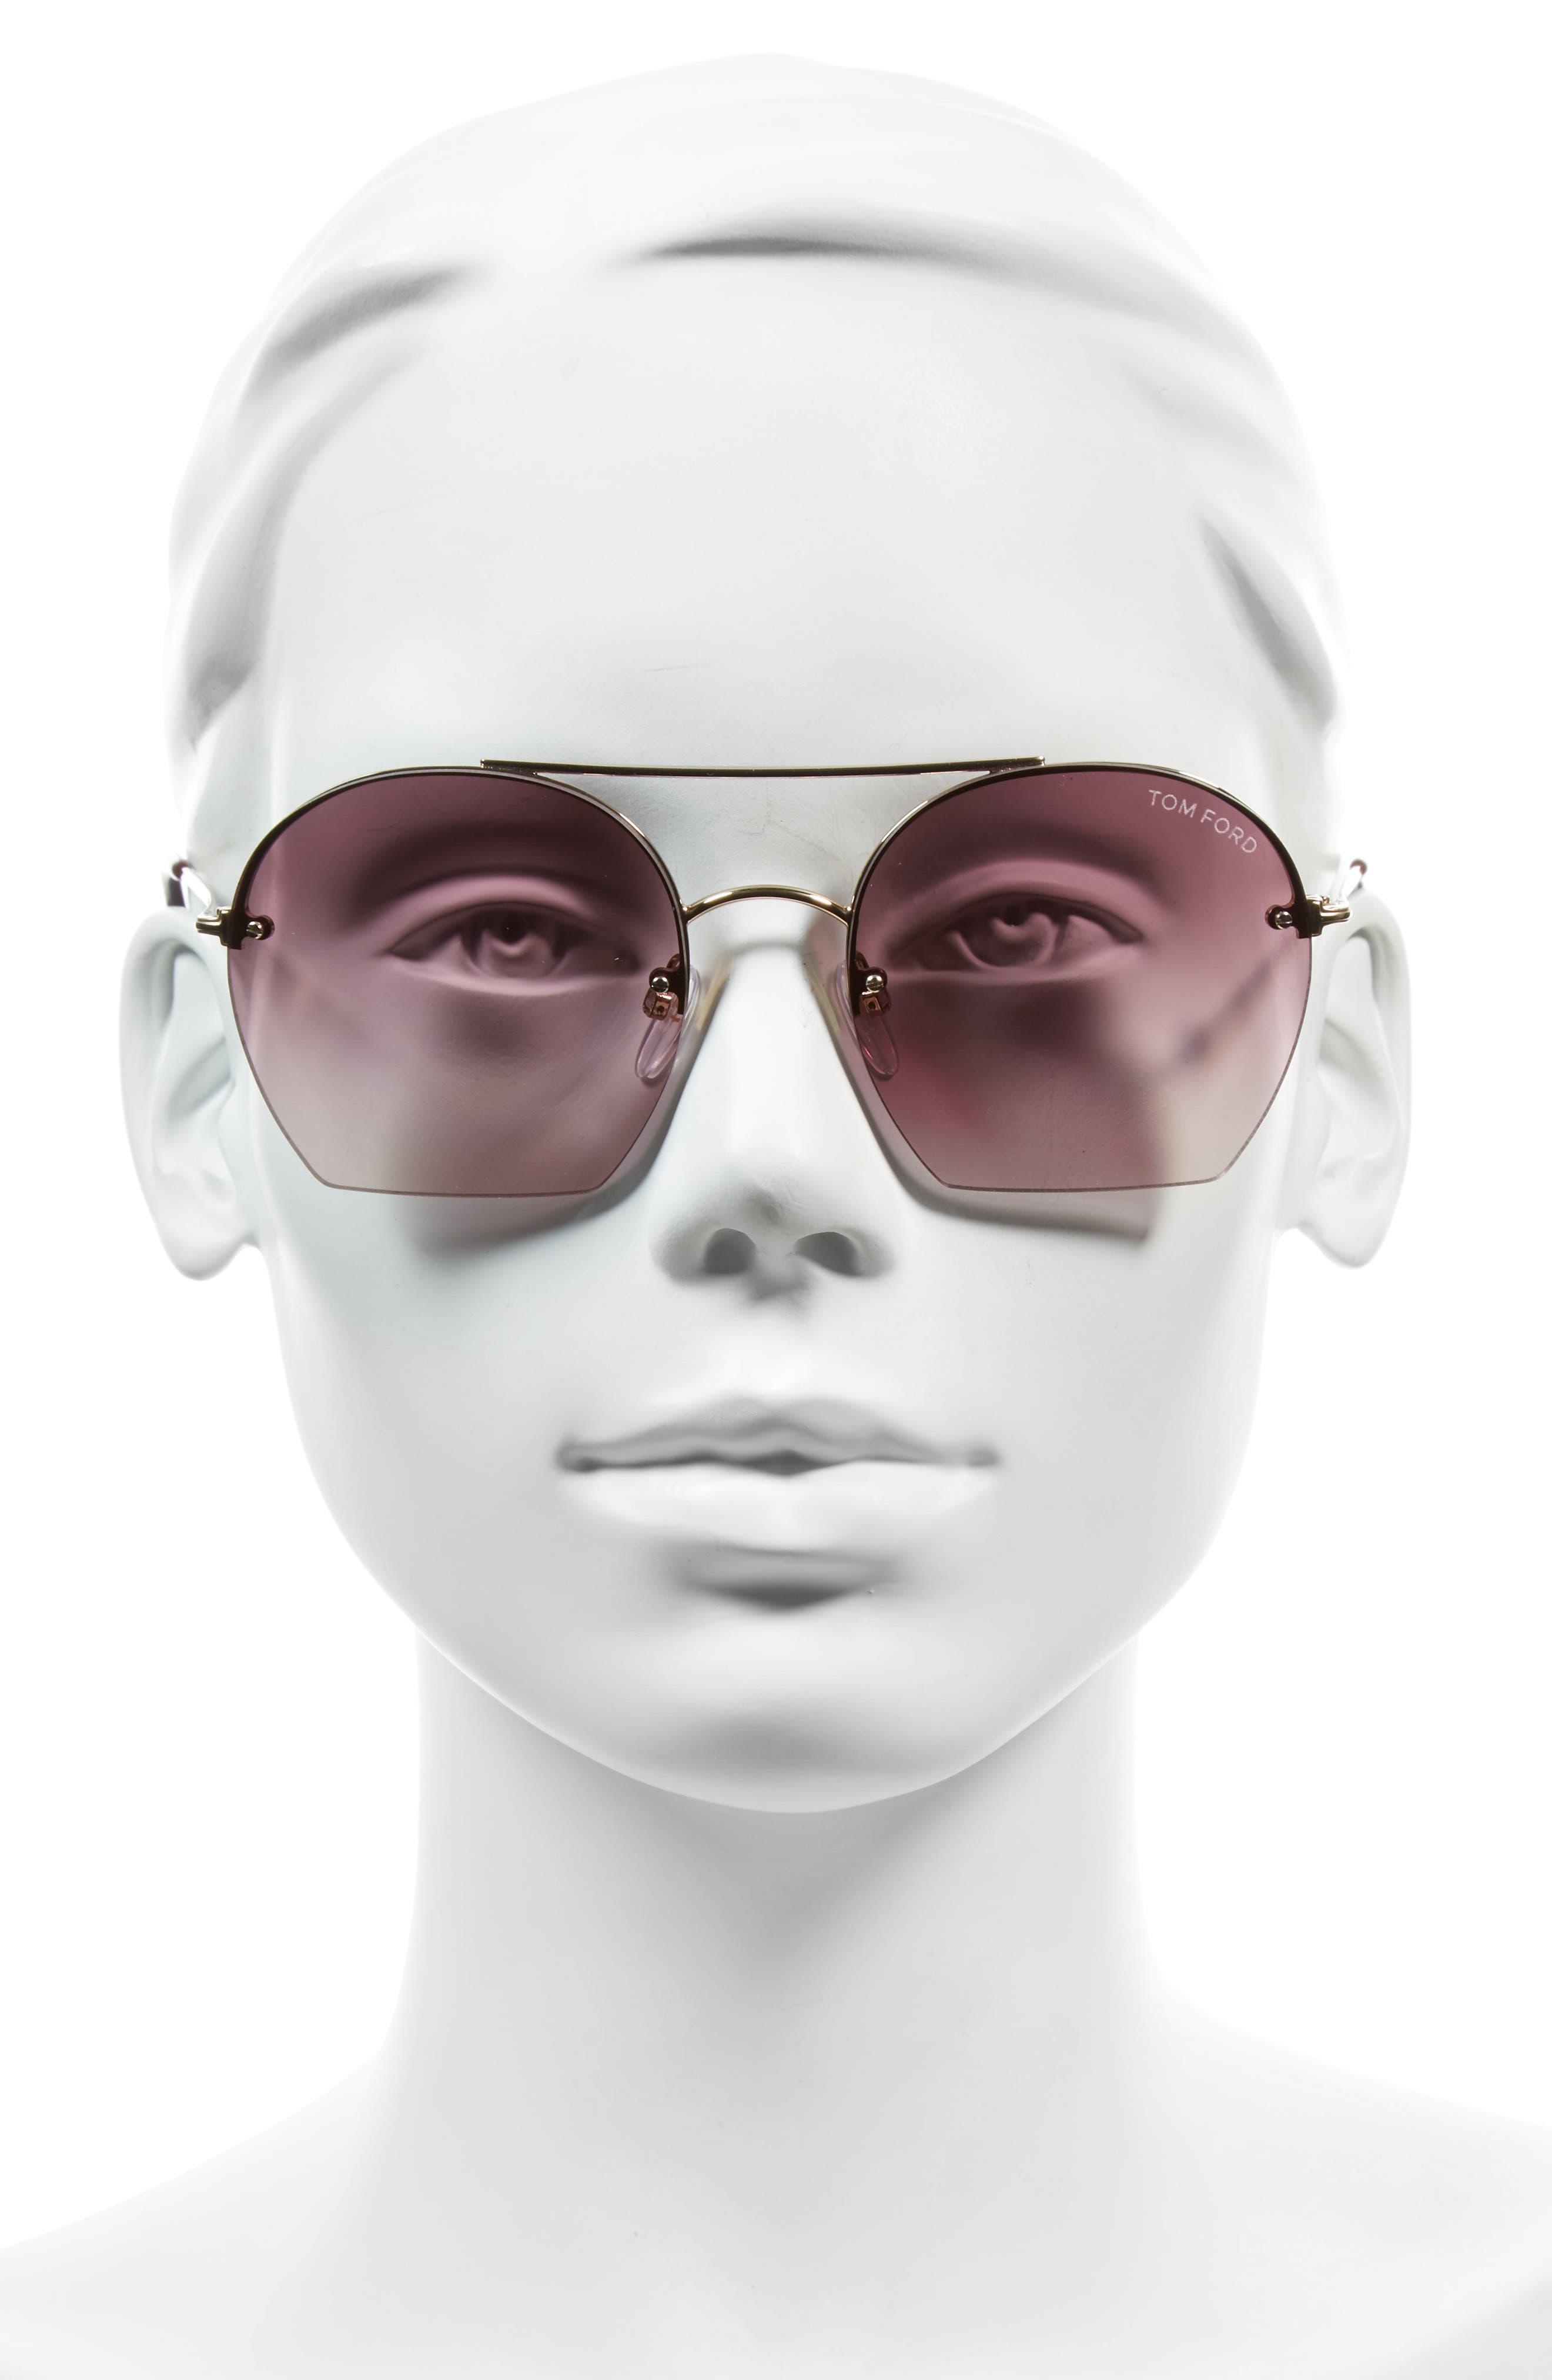 Antonia 55mm Gradient Lens Aviator Sunglasses,                             Alternate thumbnail 2, color,                             Rose Gold/ Plum/ Gradient Pink